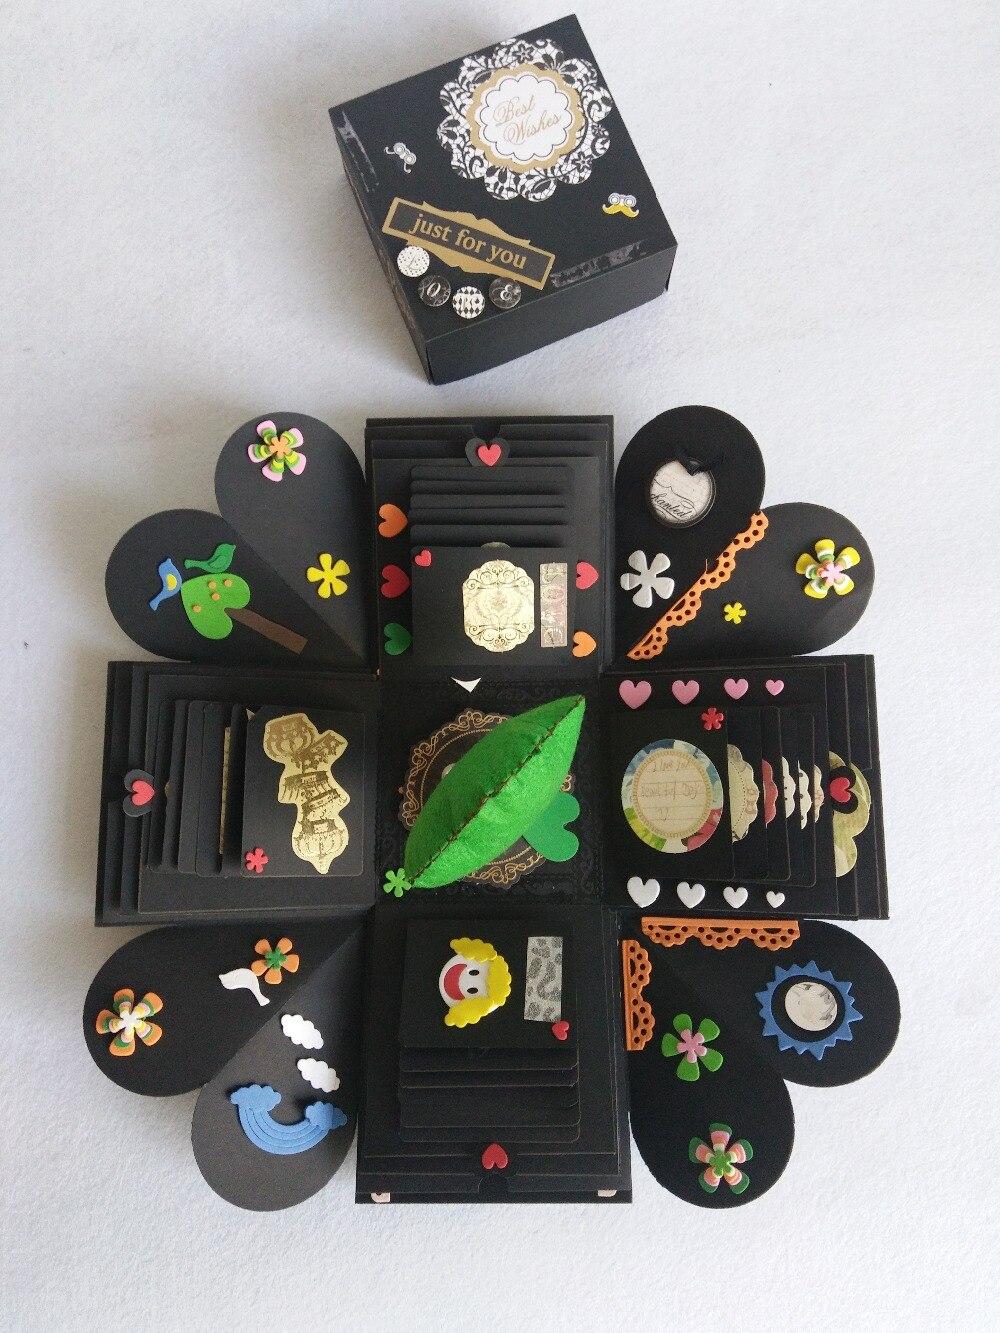 Handmade gifts & DIY organs explosion box photo album to send her boyfriend photo husband husband and wife birthday gift for boyfriend on anniversary